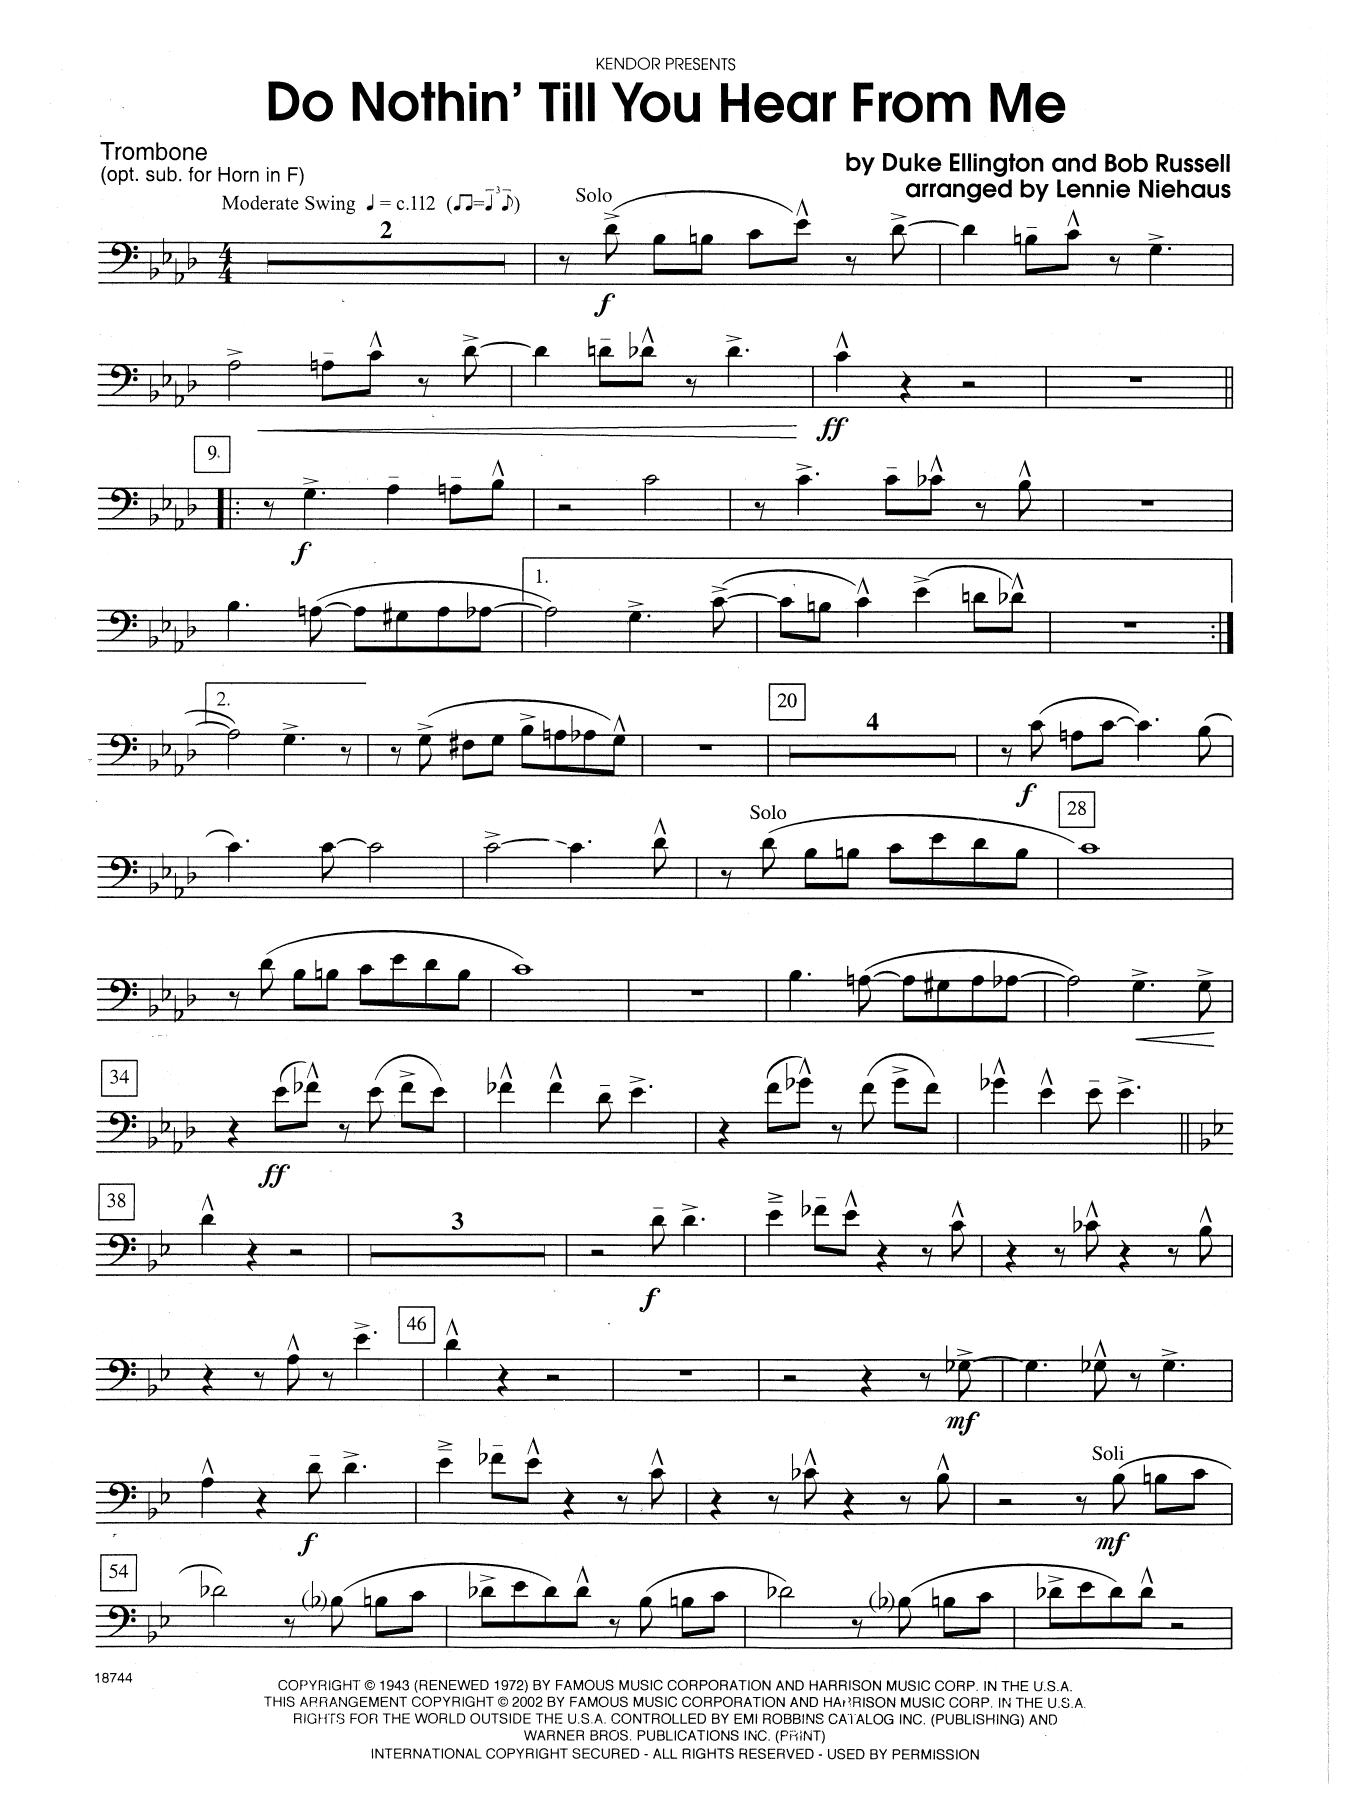 Do Nothin' Till You Hear from Me - Optional Trombone Sheet Music